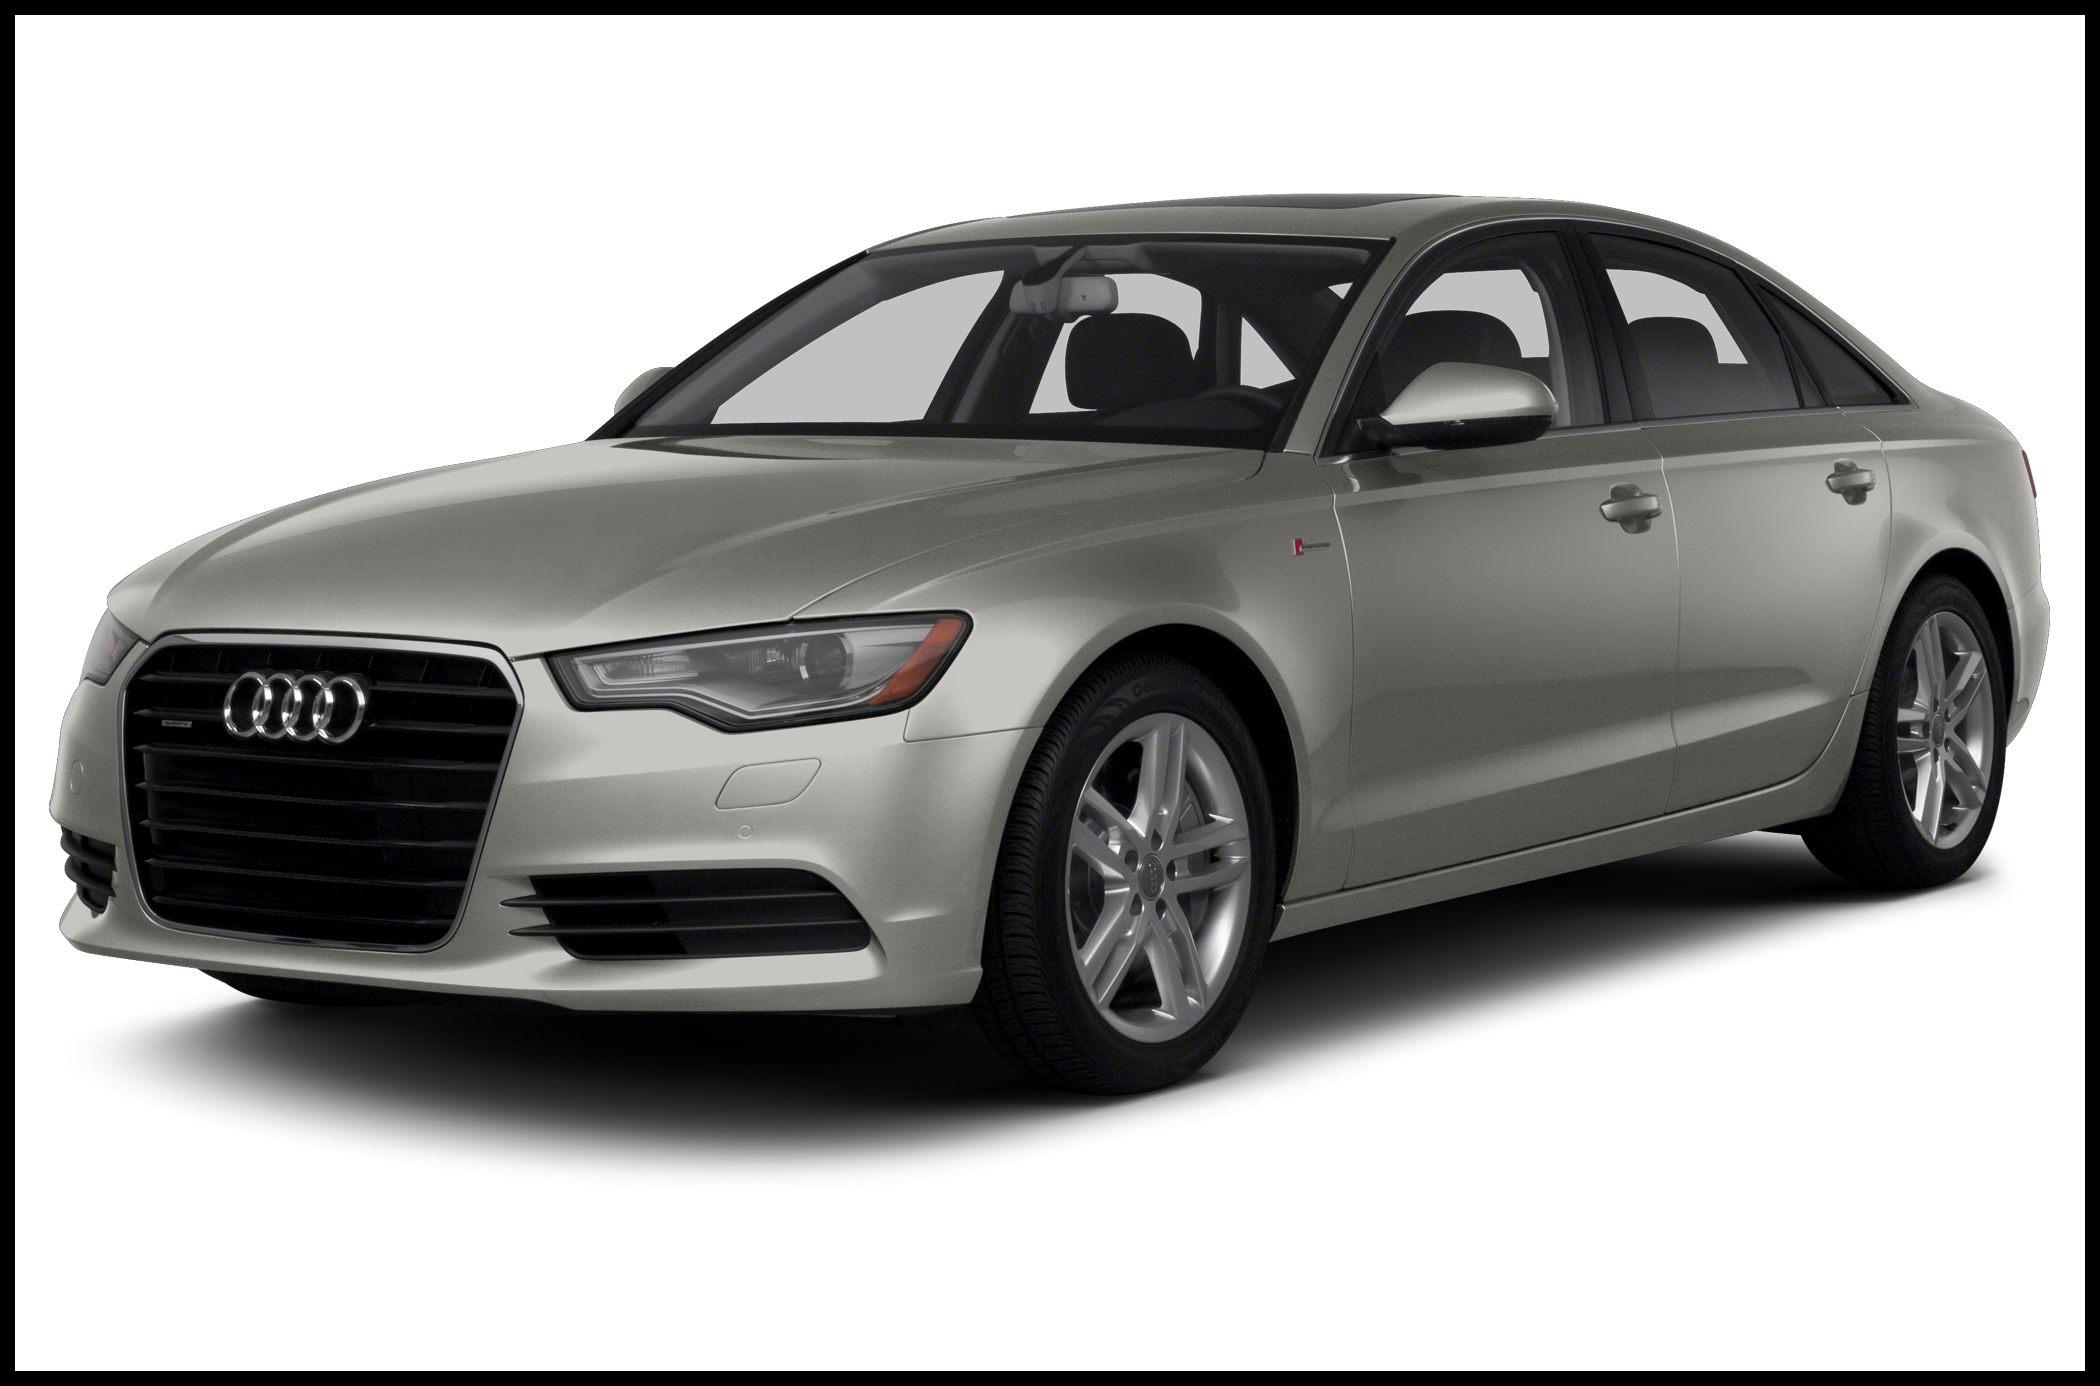 2014 Audi A6 3 0 TDI Premium Plus 4dr All wheel Drive quattro Sedan Pricing and Options